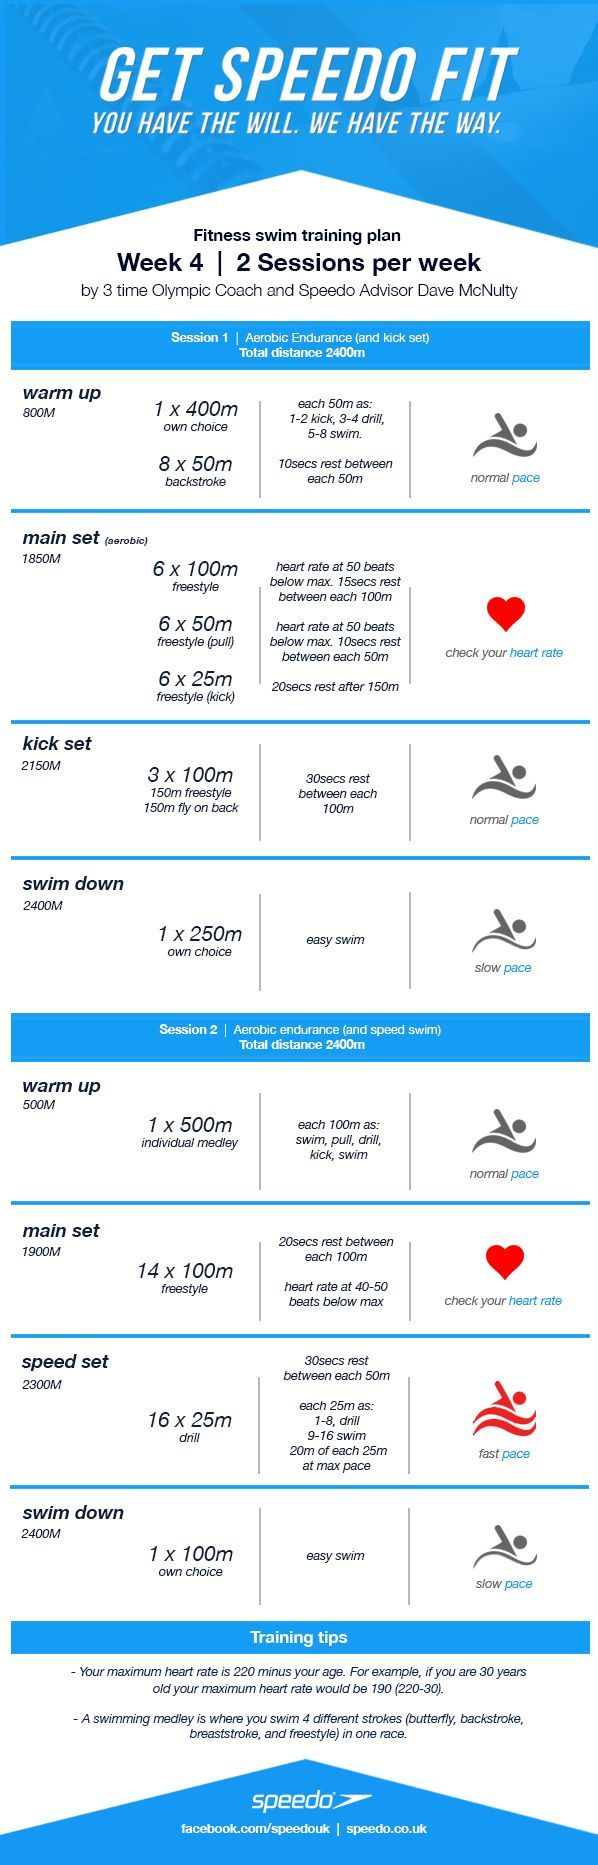 Hello again fitness swimmers! It's week 4 of our 8 week swim training plan. The distance is increasing week by week. Week one was 3200 metres overall, whereas this week you'll be swimming 4800 met...